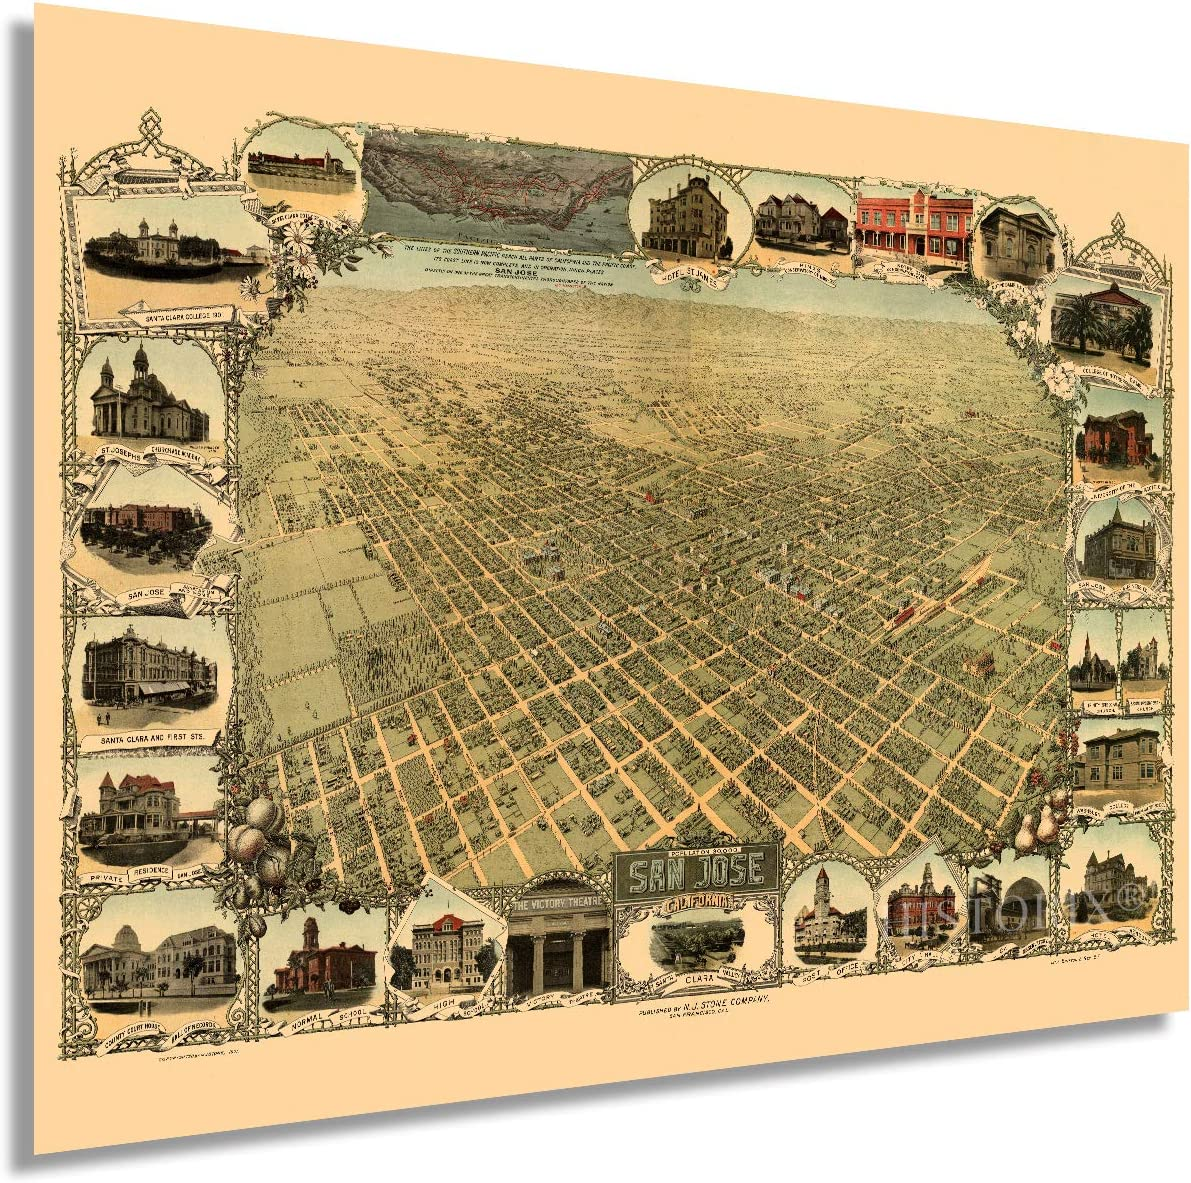 HISTORIX Vintage 1901 San Jose California Map - 18x24 Inch Vintage Map of San Jose Wall Art - Old Birds Eye View Historic Map of San Jose CA Includes Illustrations of Points of Interest (2 Sizes)